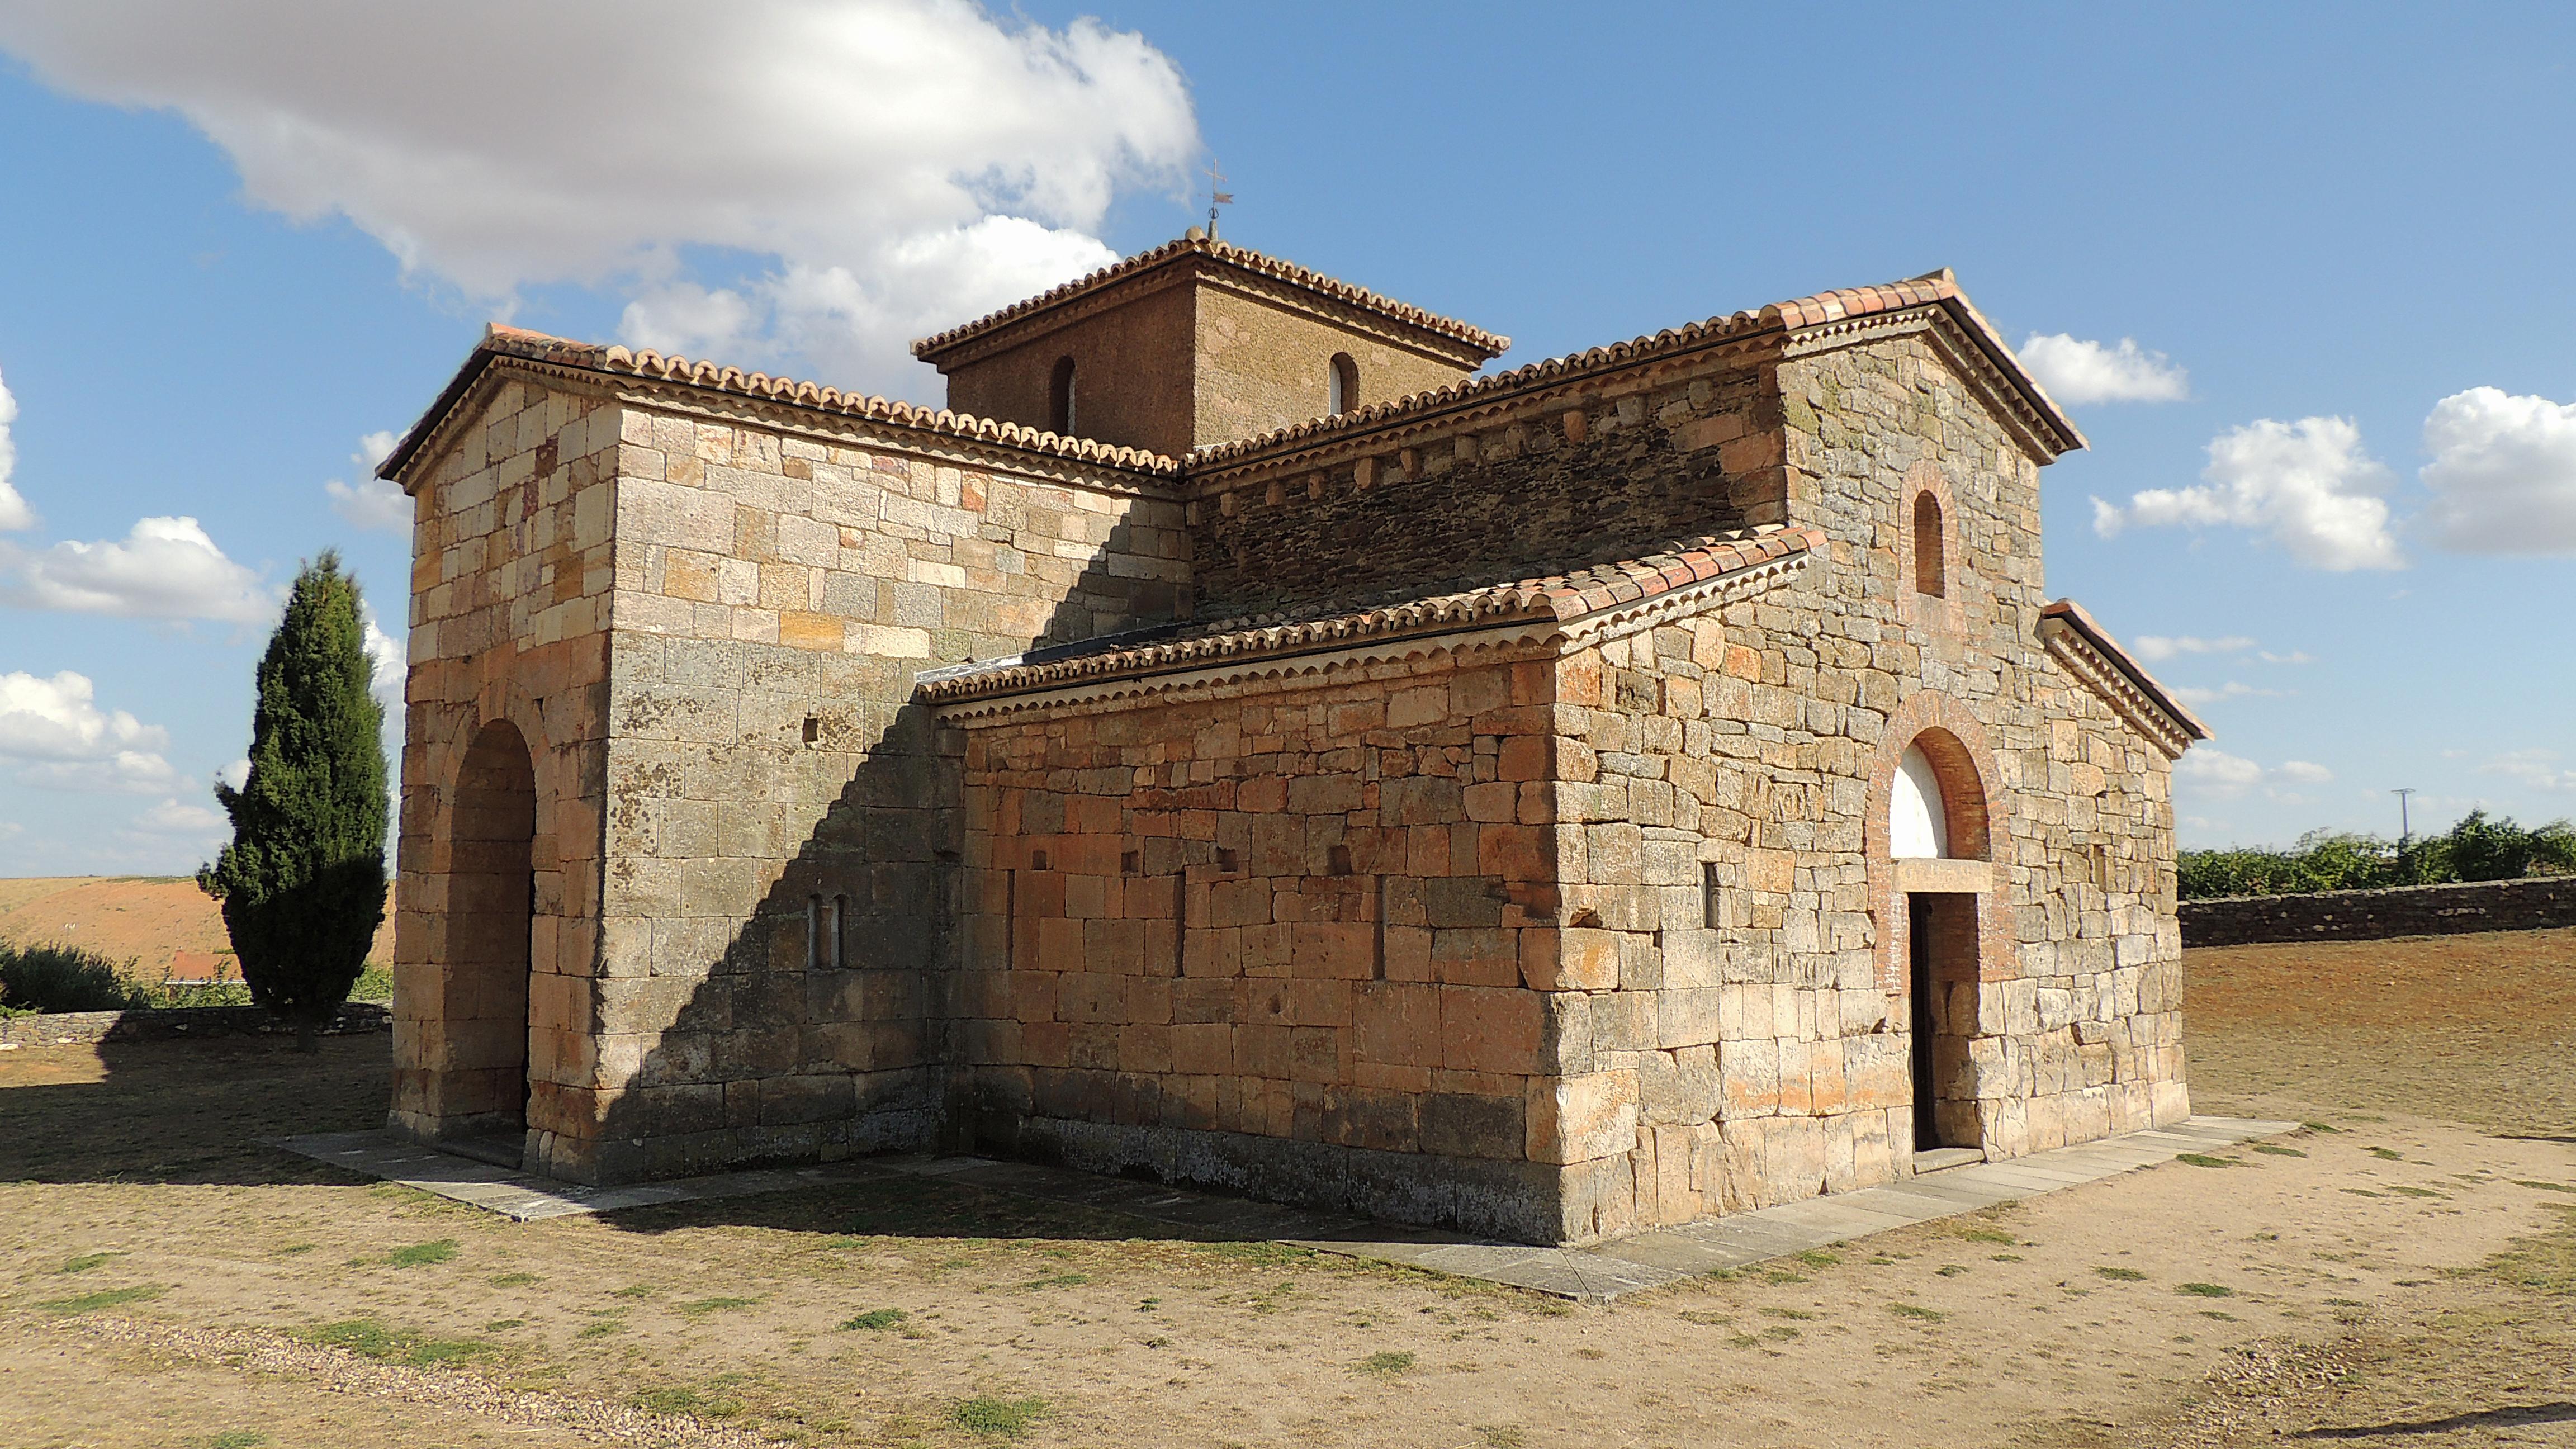 Iglesia de San Pedro de la Nave (El Campillo) - Wikipedia, la enciclopedia  libre